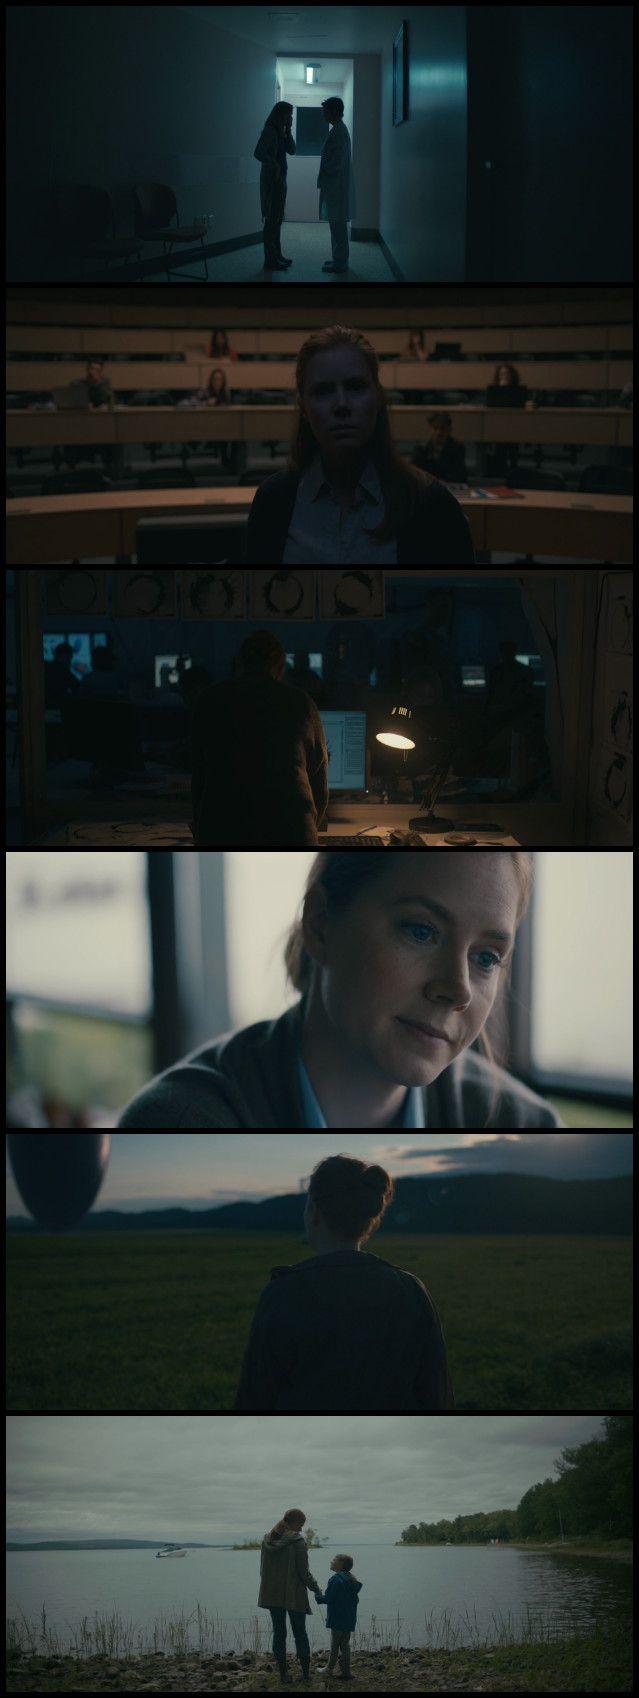 Arrival (2016) Director: Denis Villeneuve. Photography: Bradford Young.